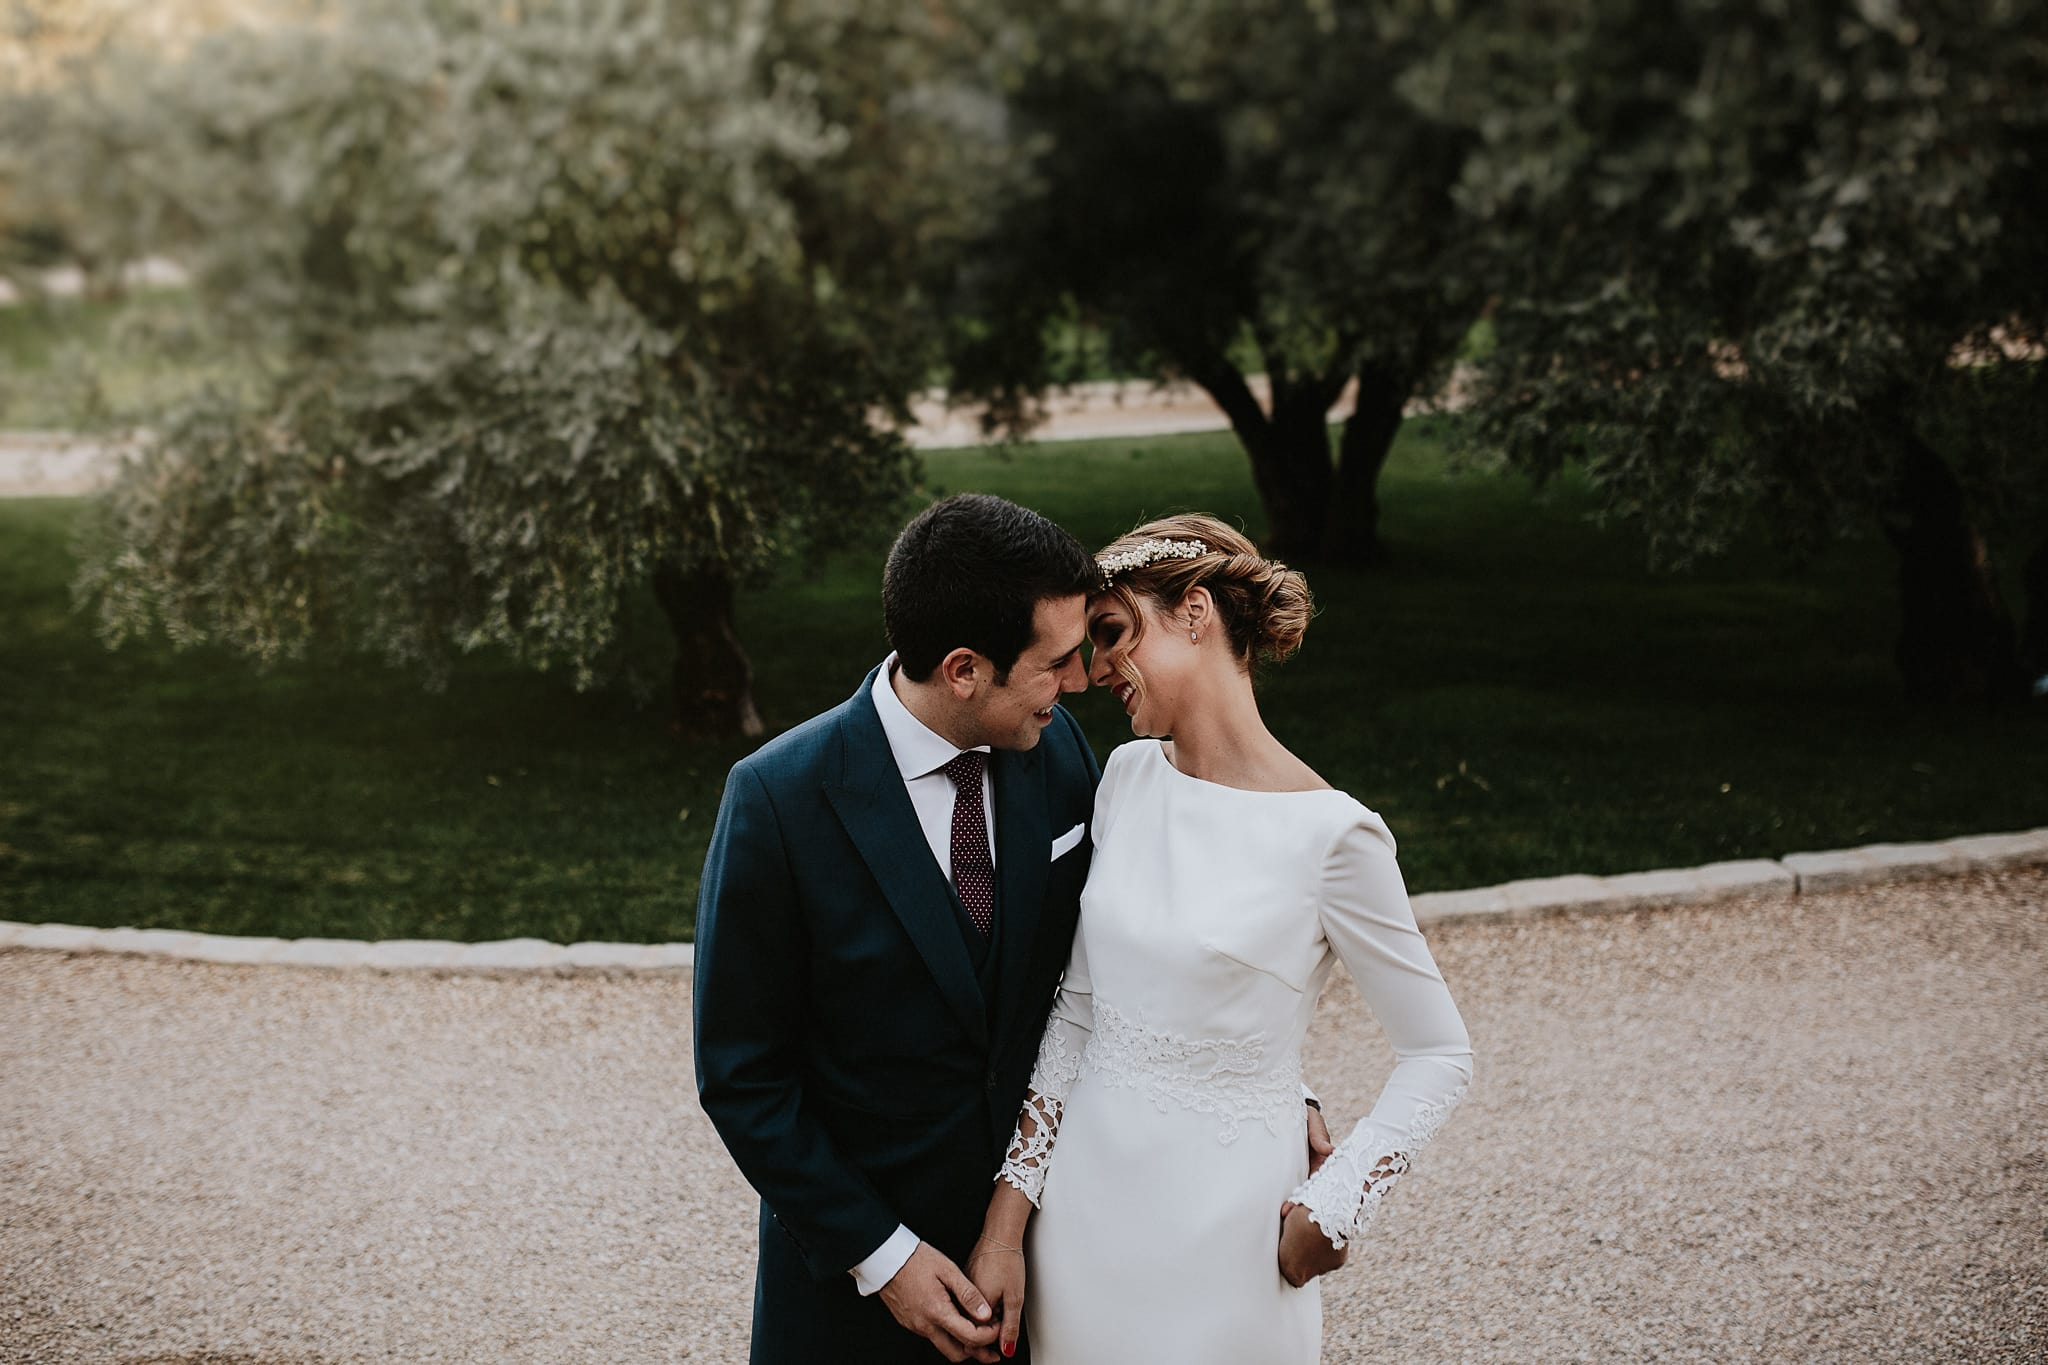 prisma-blanco-fotografos-bodas-toledo-81